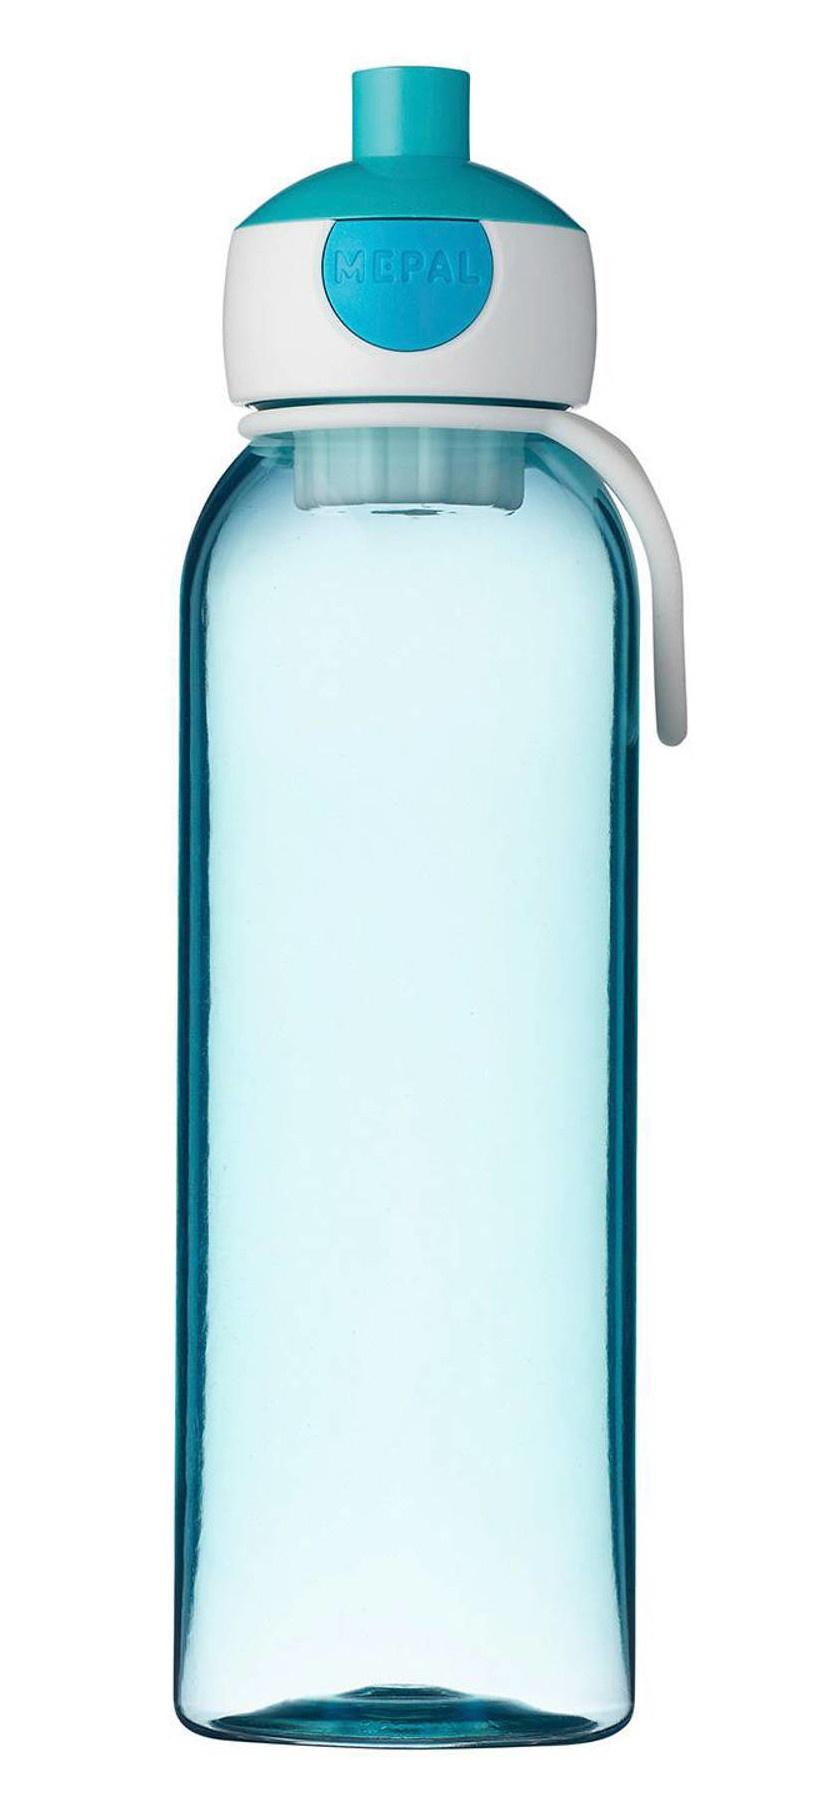 Rosti Mepal drinking bottle Campus500 ml turquoise - Internet-Sport&Casuals